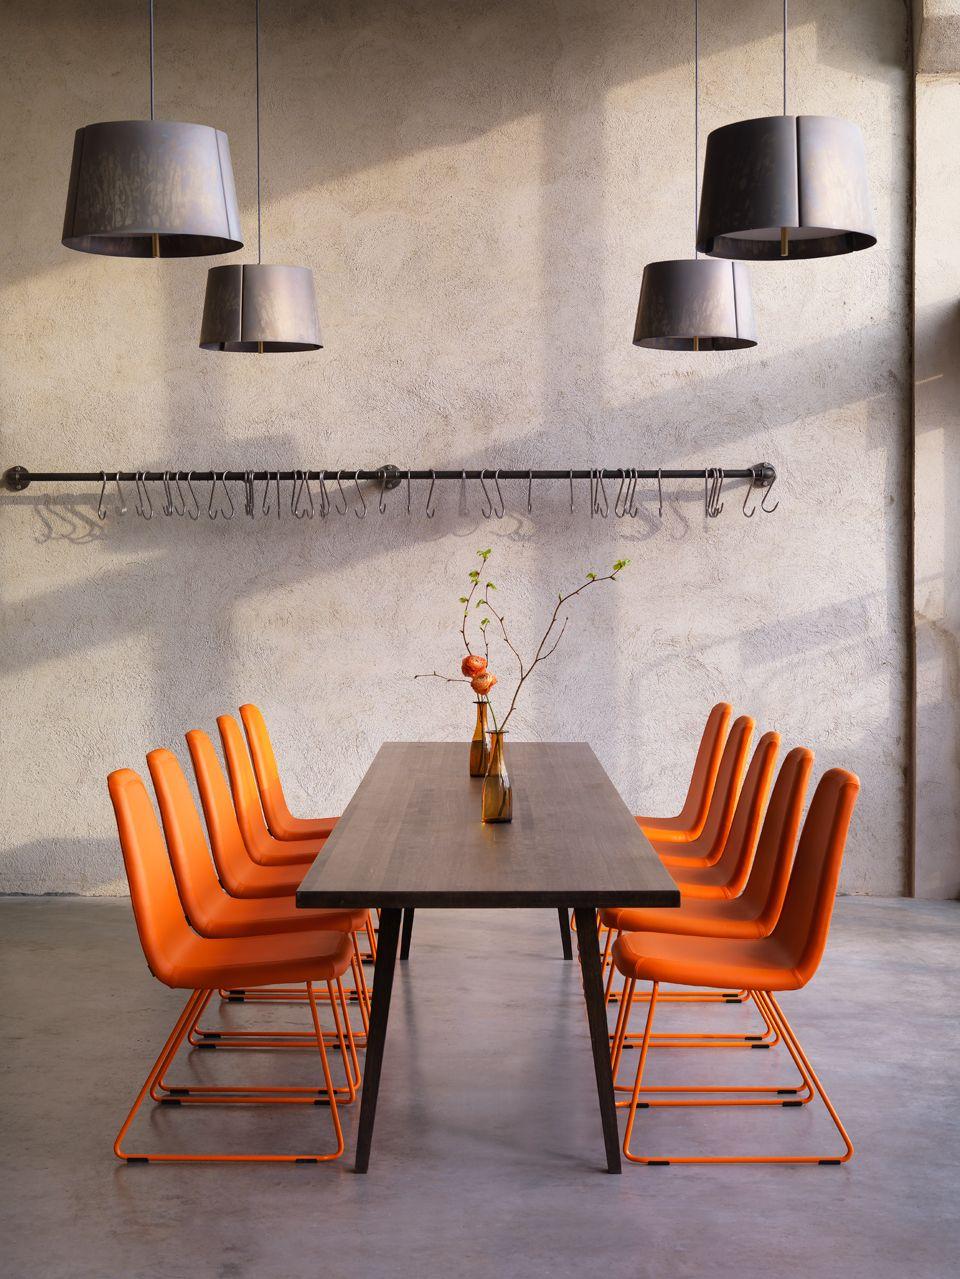 Oranje met donkerbruin hout, modern in een industriële omgeving